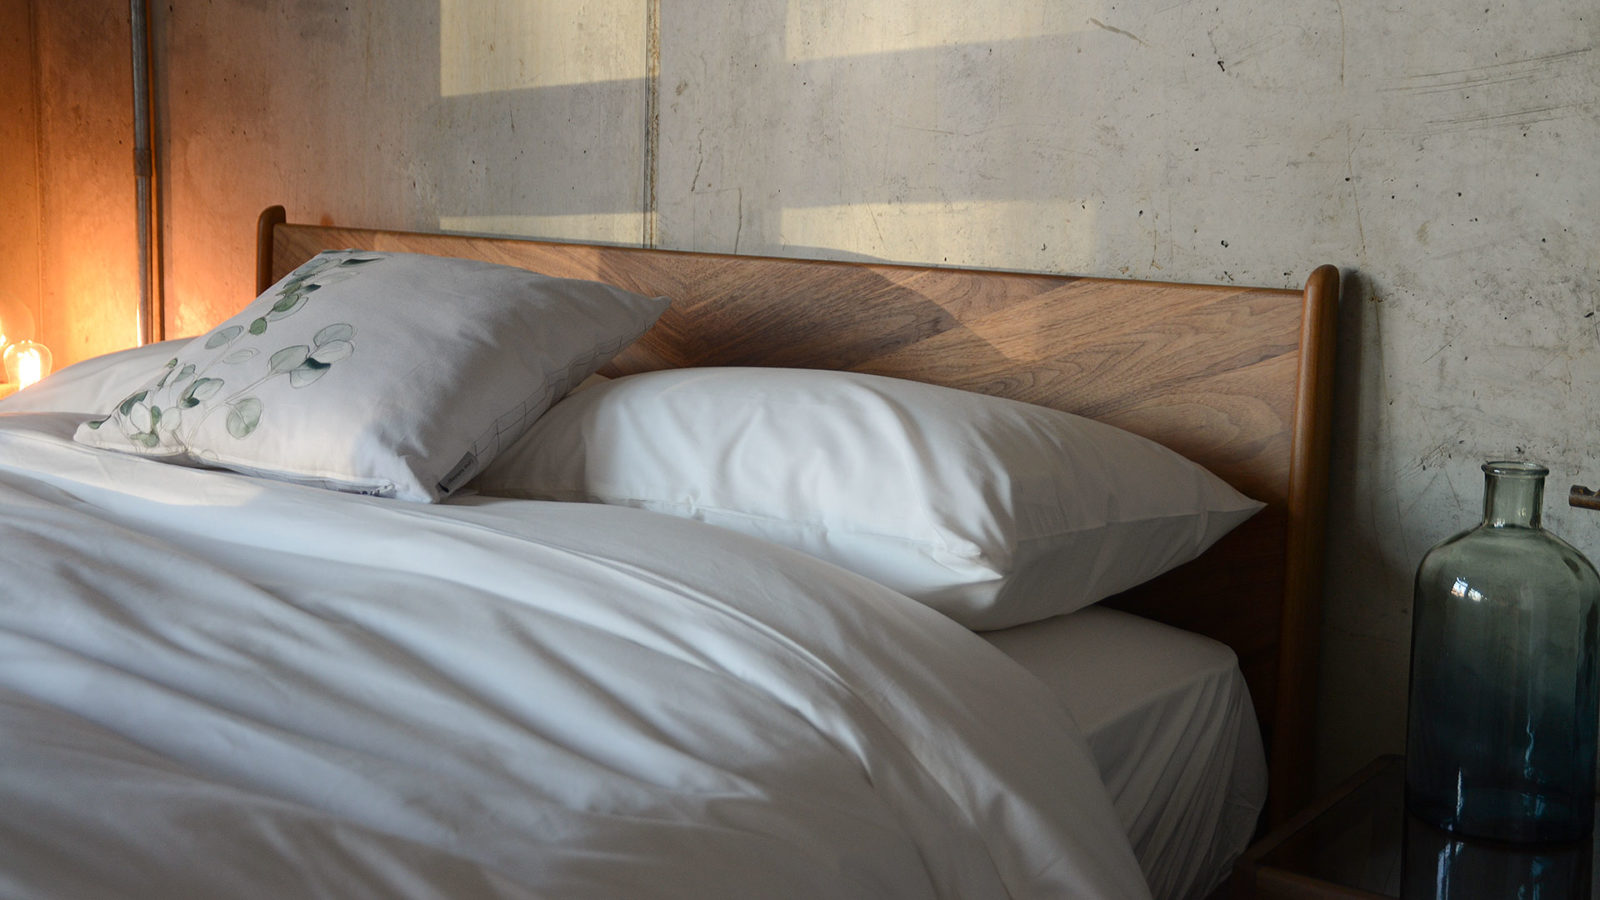 ivory white organic cotton bedding